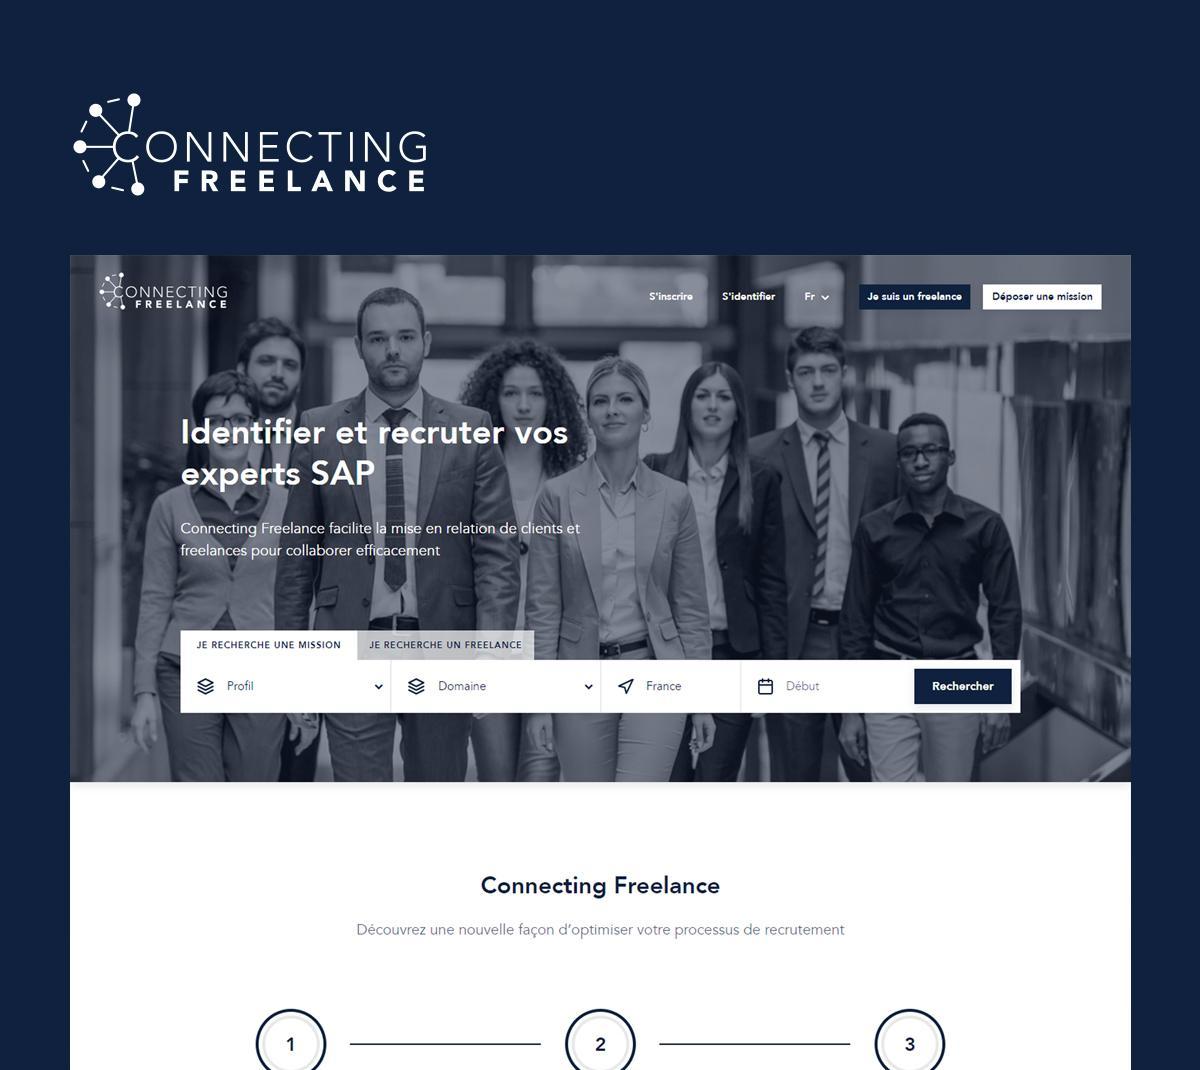 Cocolabs_images_portfolio_ConnectingFreelance-small-02.jpg